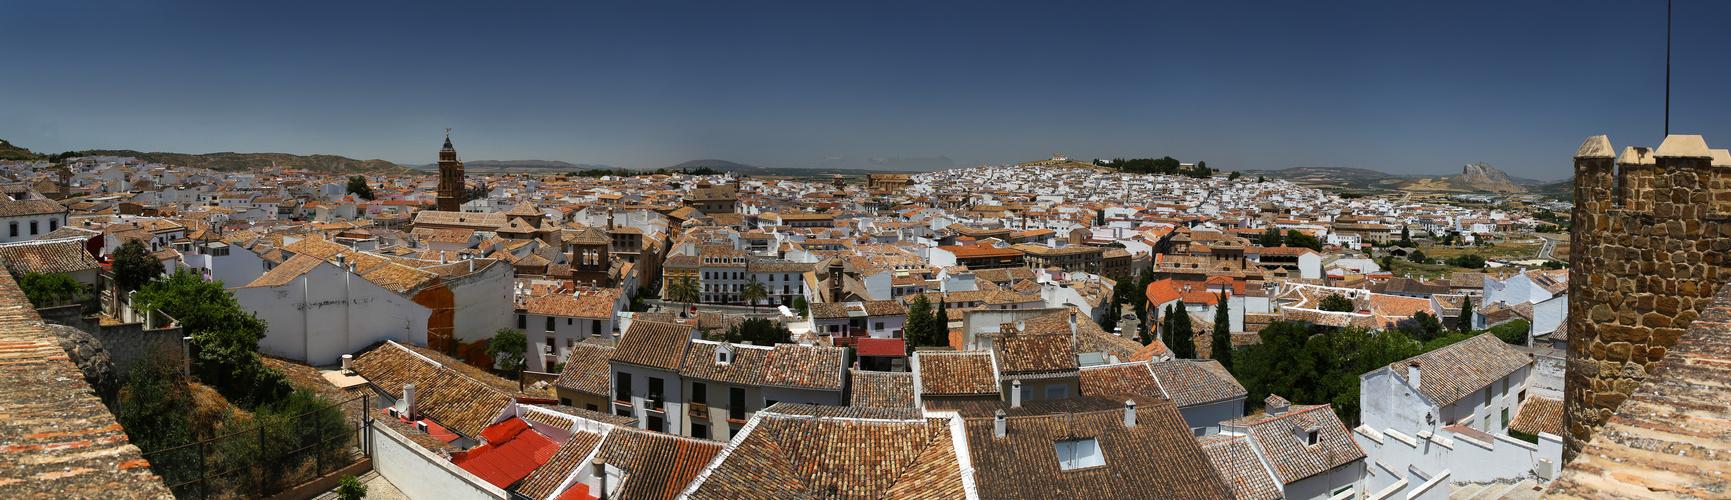 Antequera Panorama